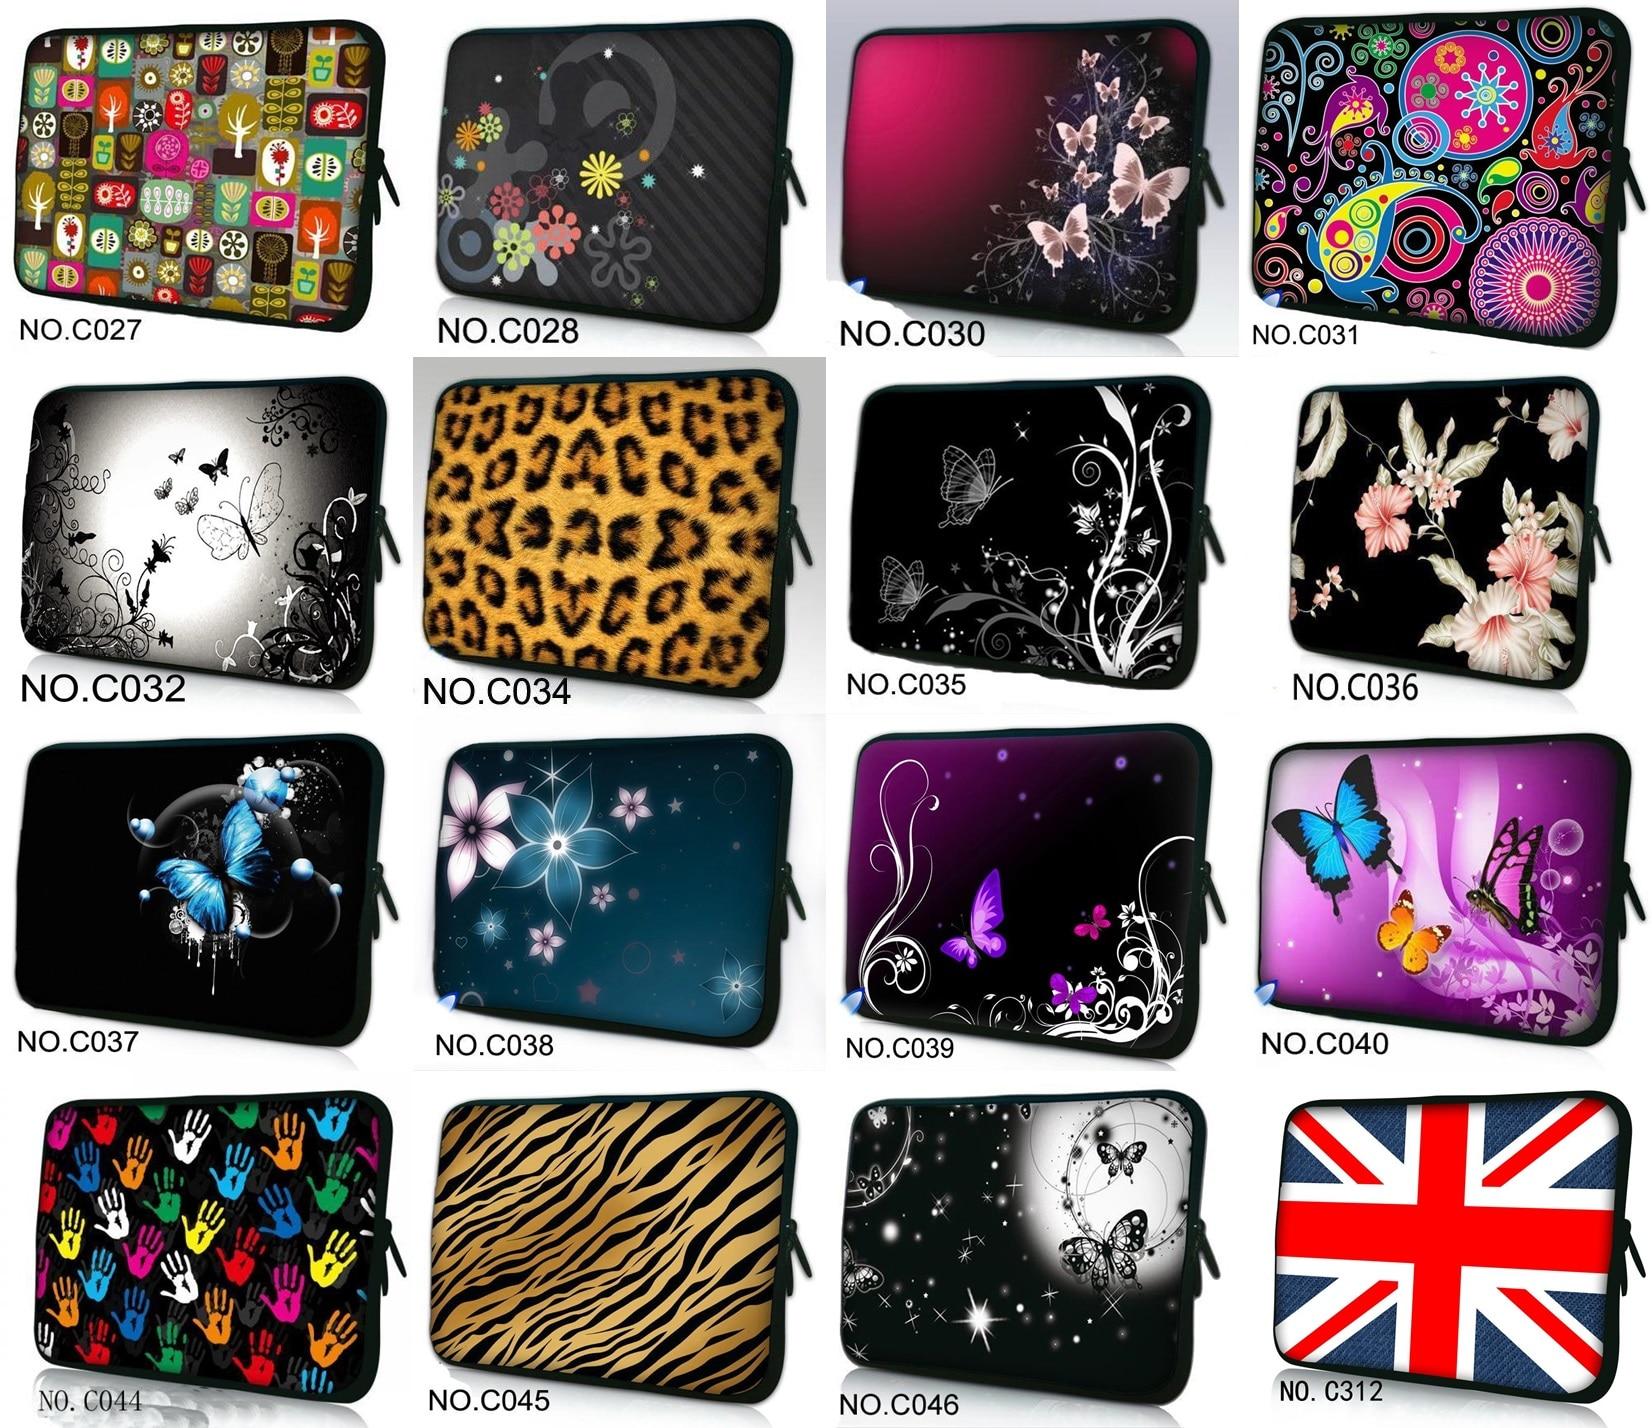 Mac Laptop Cover Case For Macbook Pro Air Retina 11 13 Ultrabook Notebook Sleeve bag Portable zipper bag laptop bag Sleeve